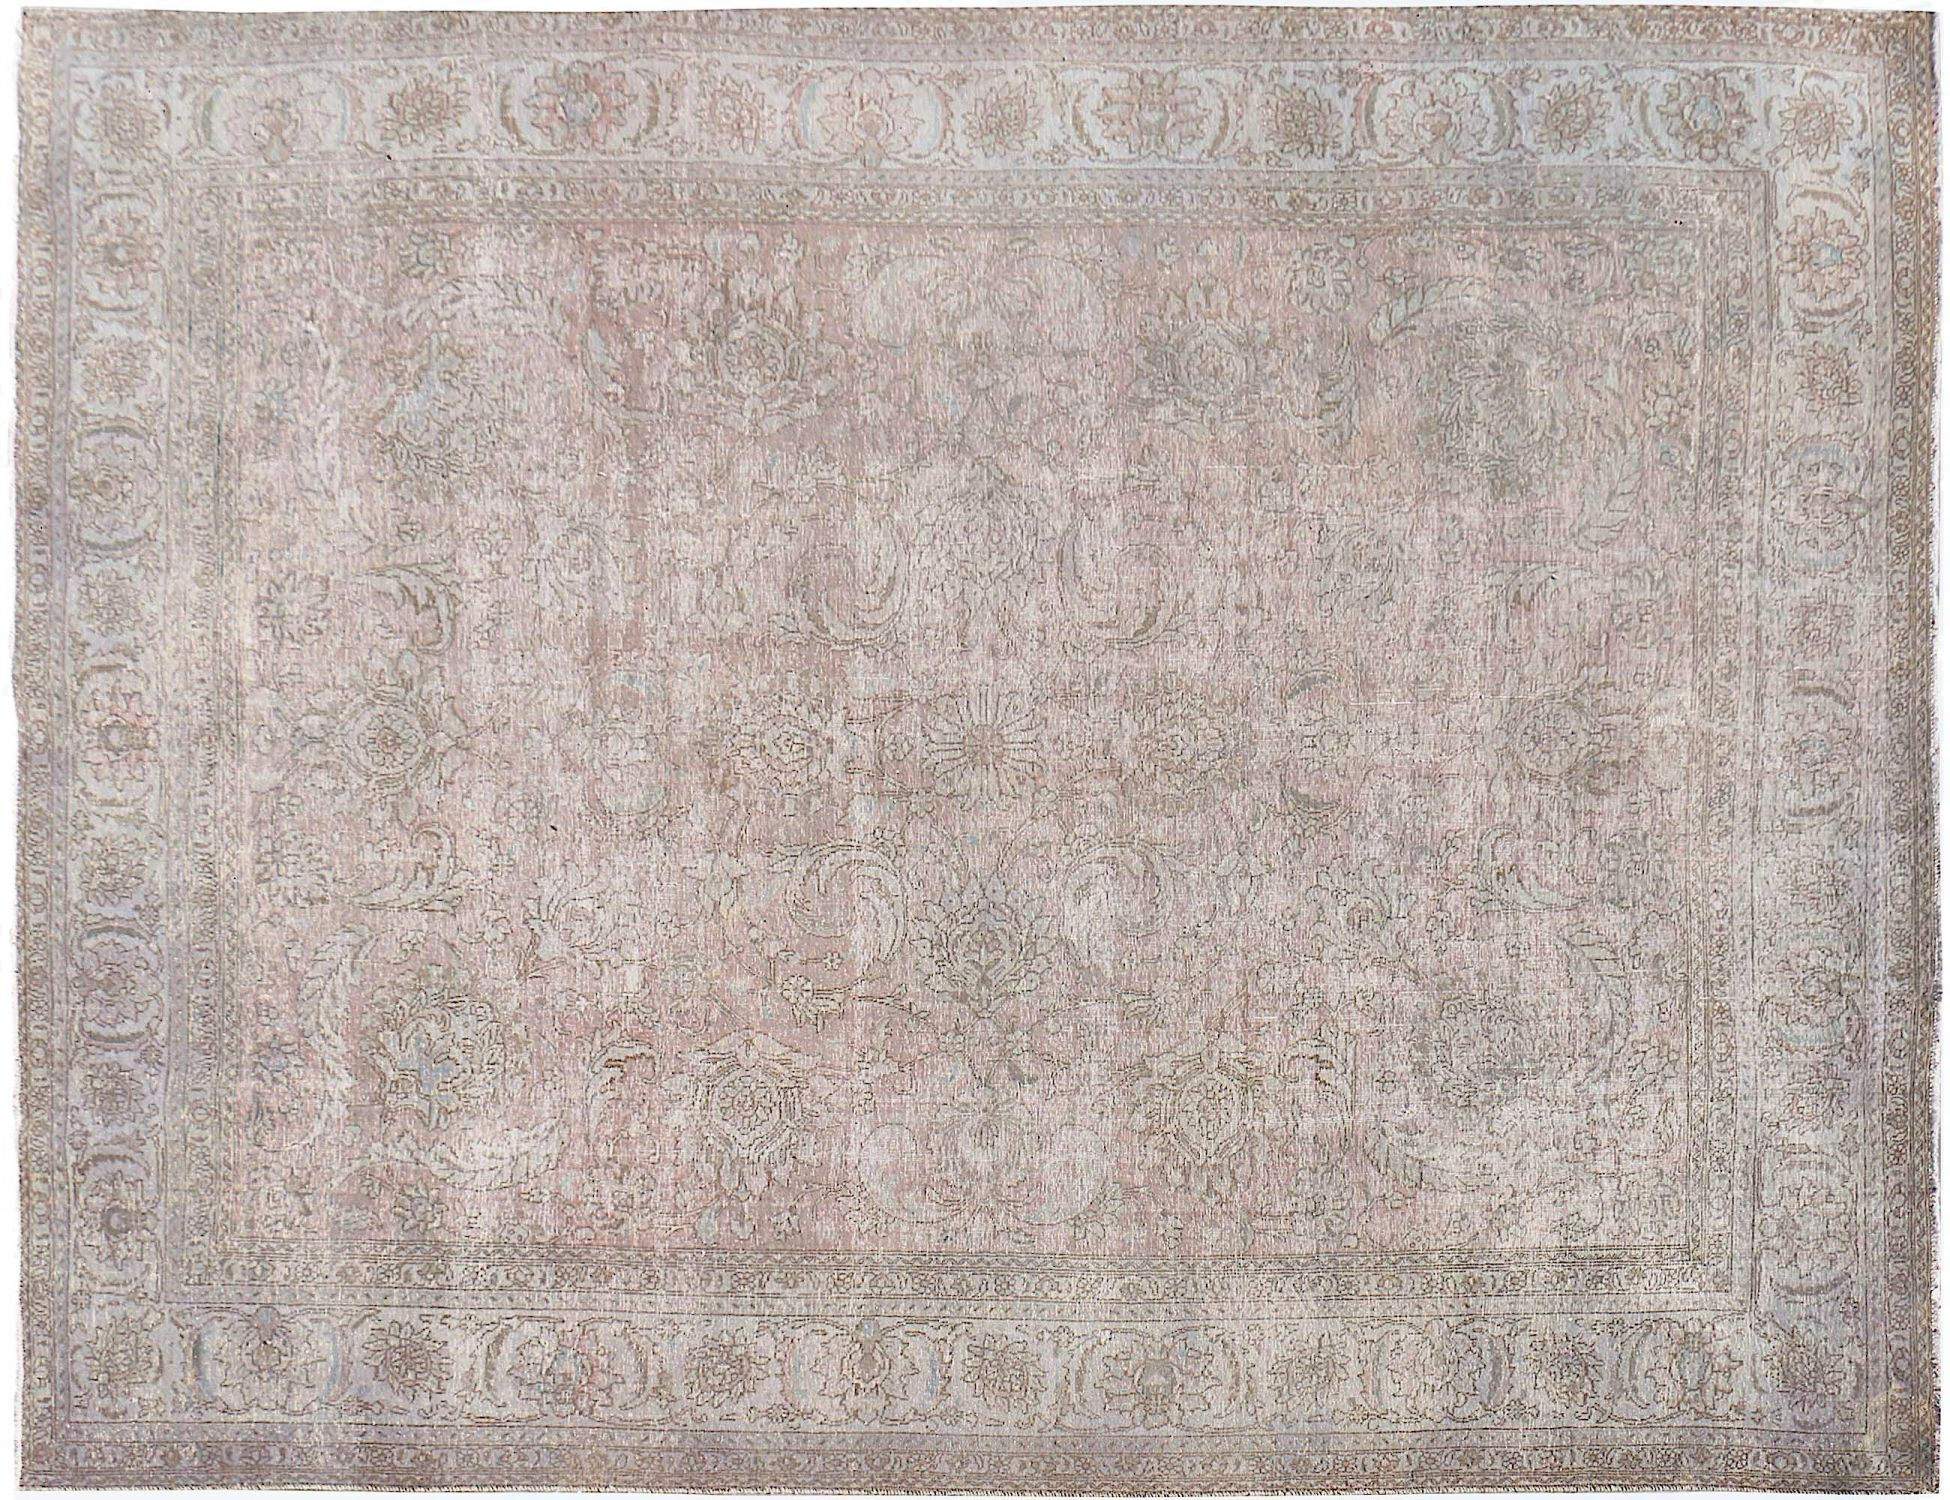 Vintage Perserteppich  grau <br/>397 x 286 cm